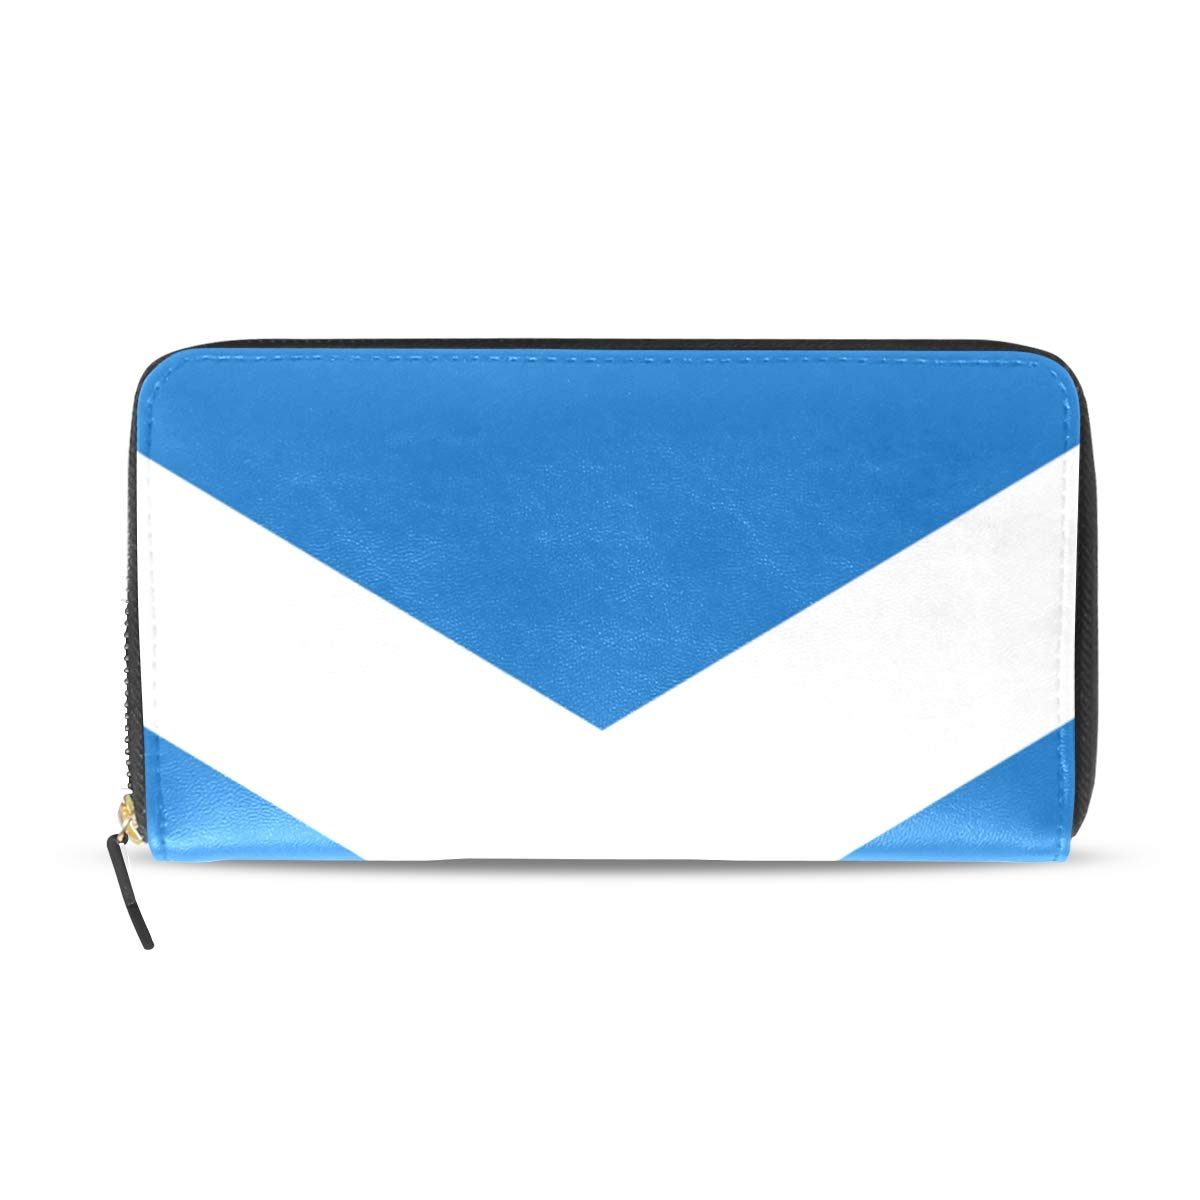 Womens Wallets Flag Of Ireland Eagle Leather Passport Wallet Coin Purse Girls Handbags